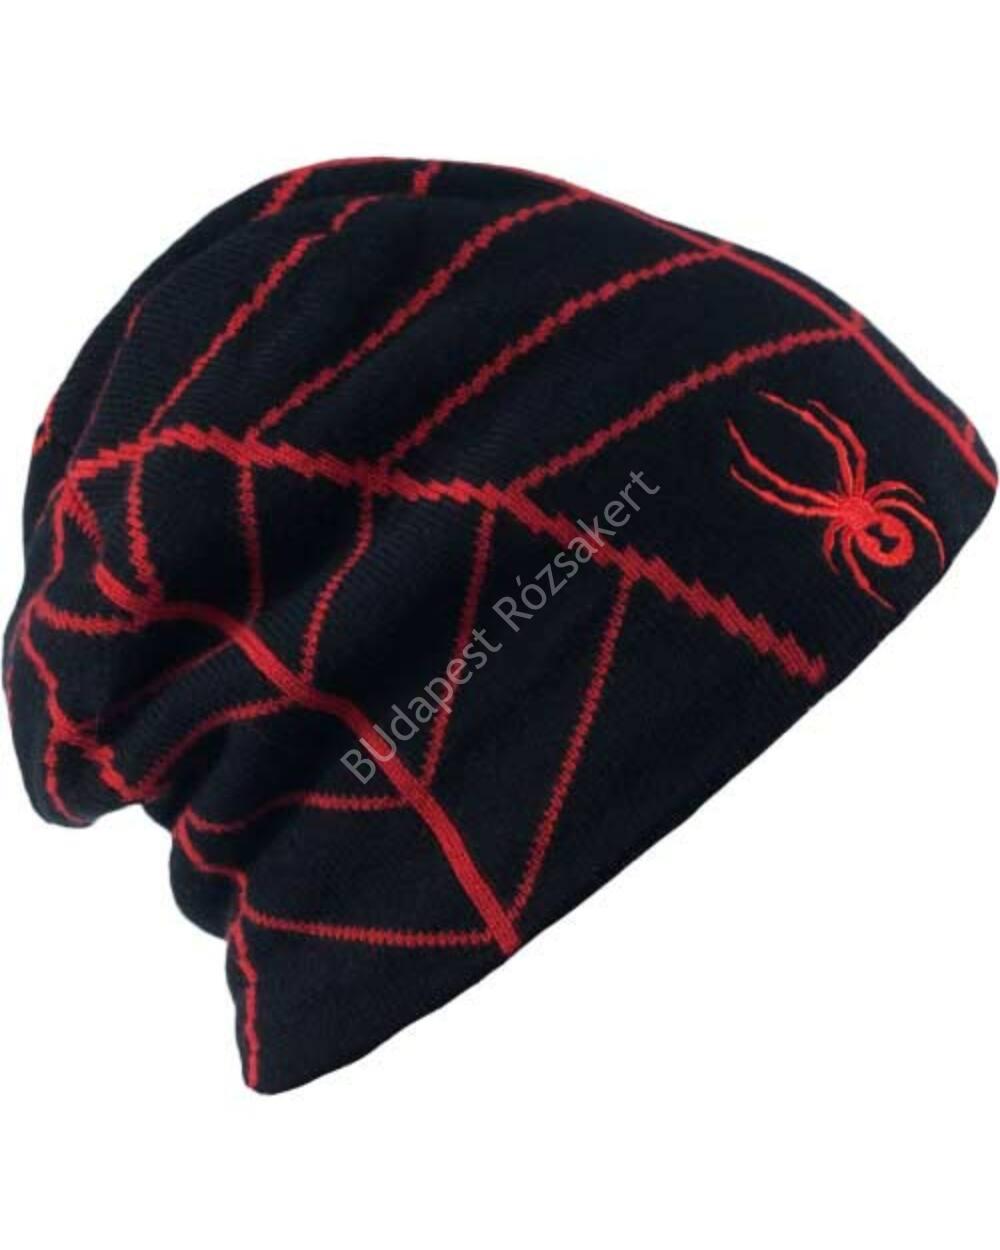 Spyder Web férfi sísapka, fekete-piros